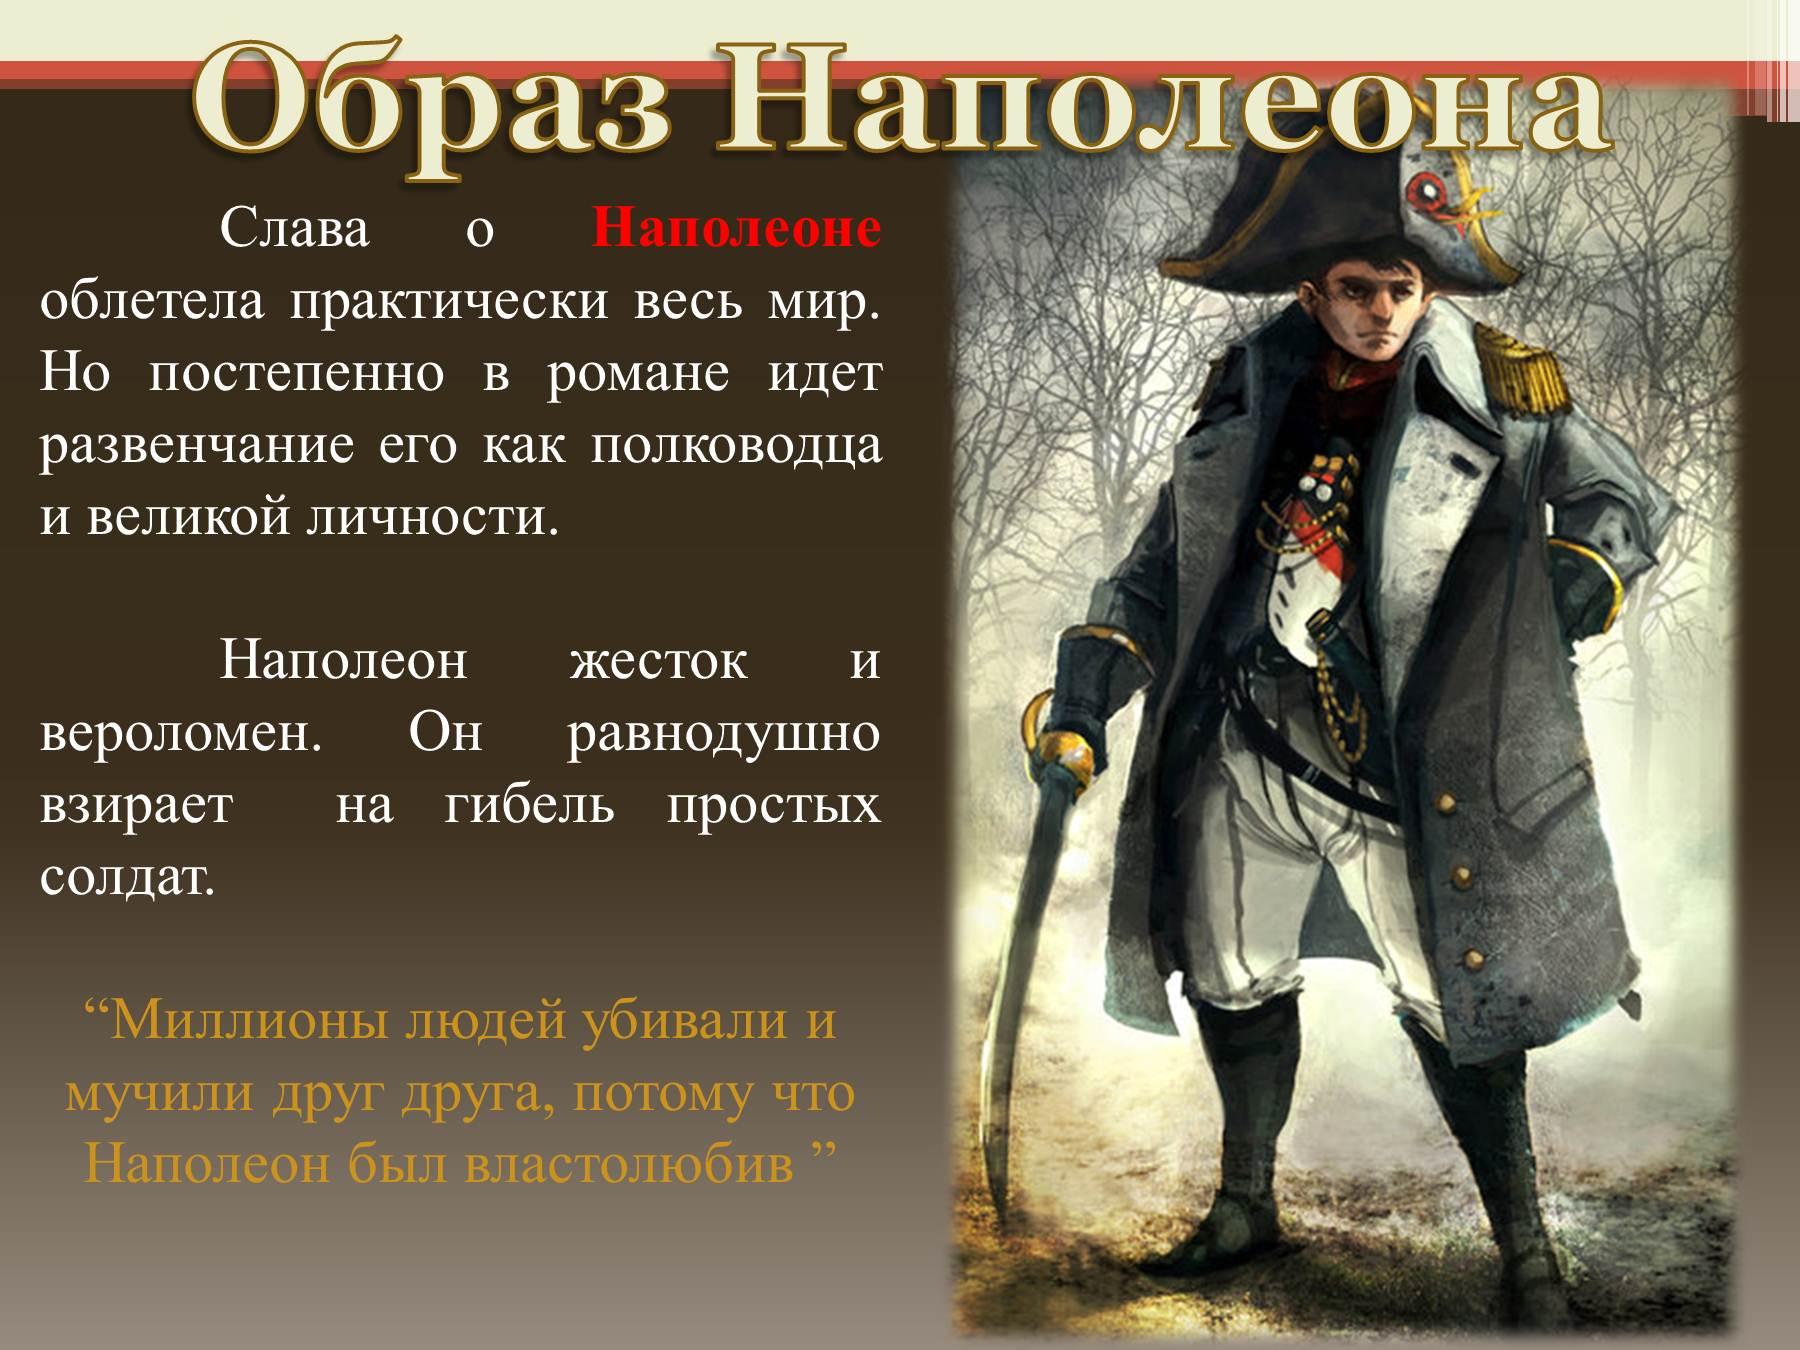 Сочинение кутузов и наполеон в романе война и мир с цитатами